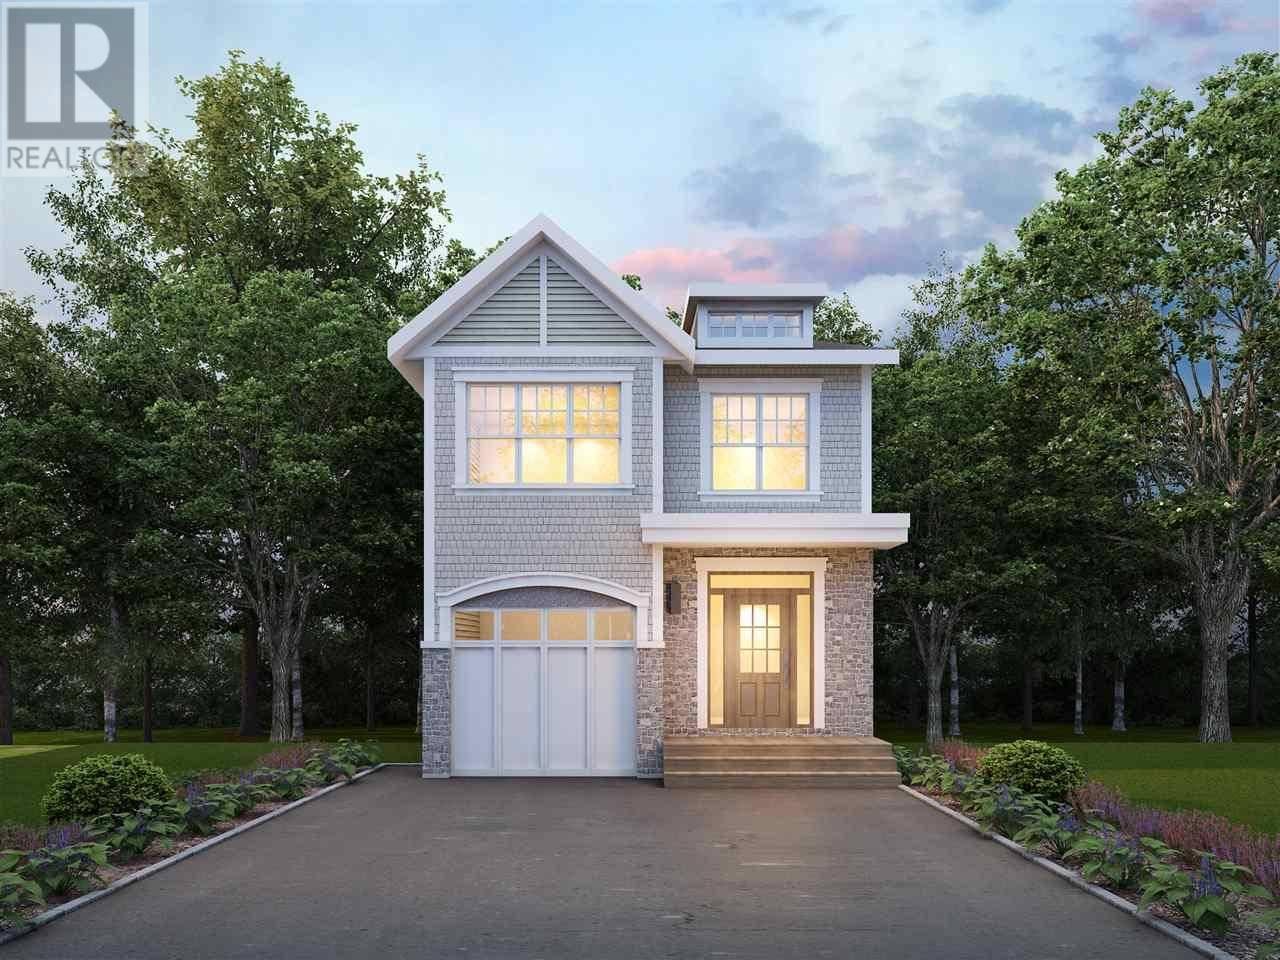 House for sale at 39 Darjeeling Dr Unit 419 Halifax Nova Scotia - MLS: 201917354